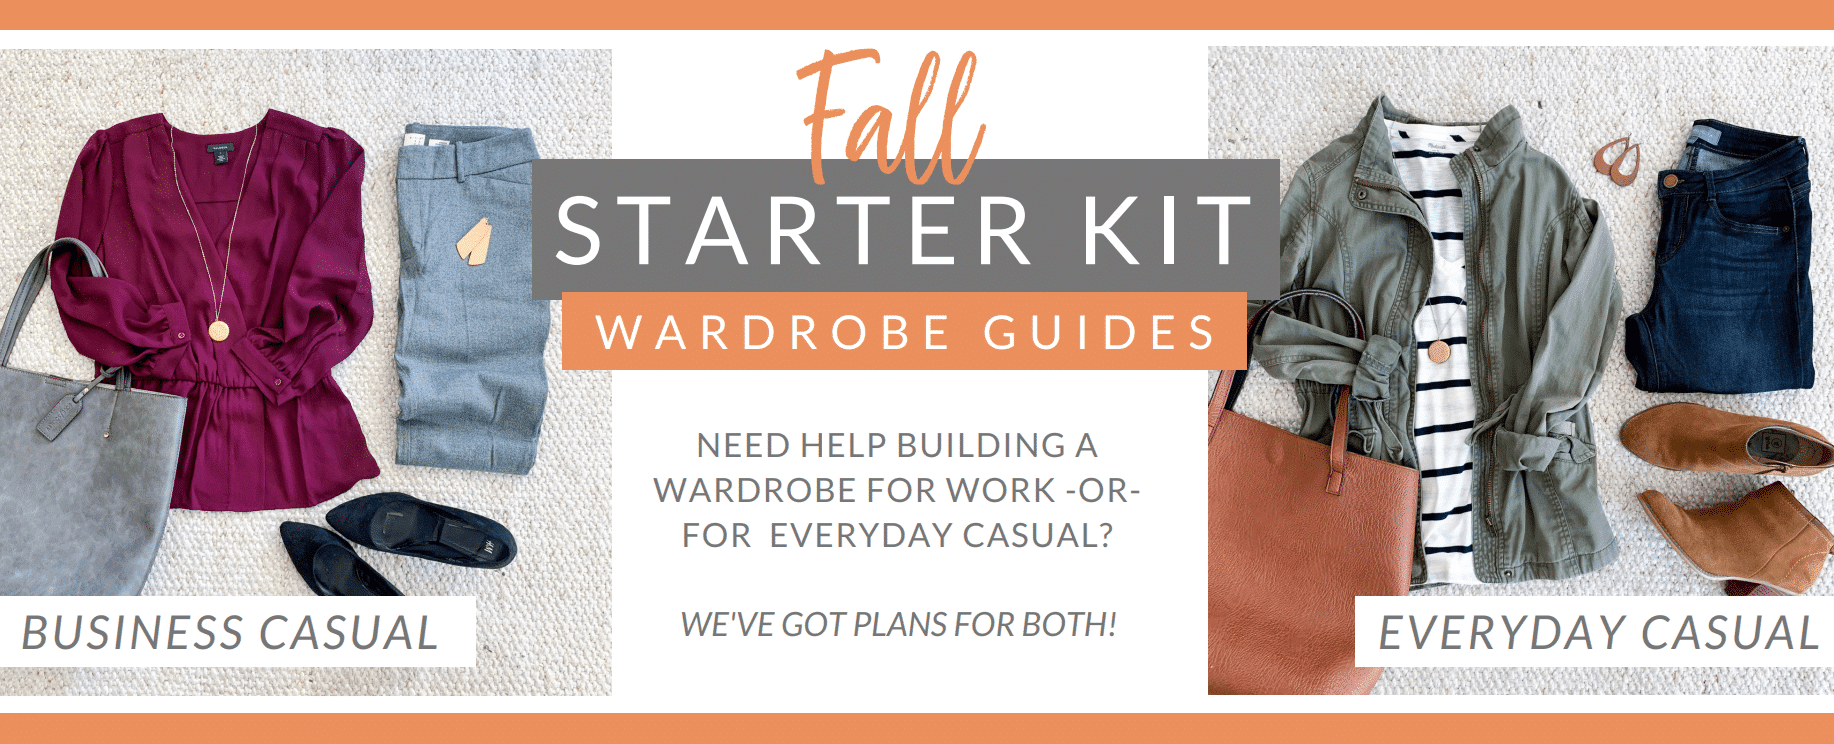 Fall Starter Kit Wardrobe Guide Footer